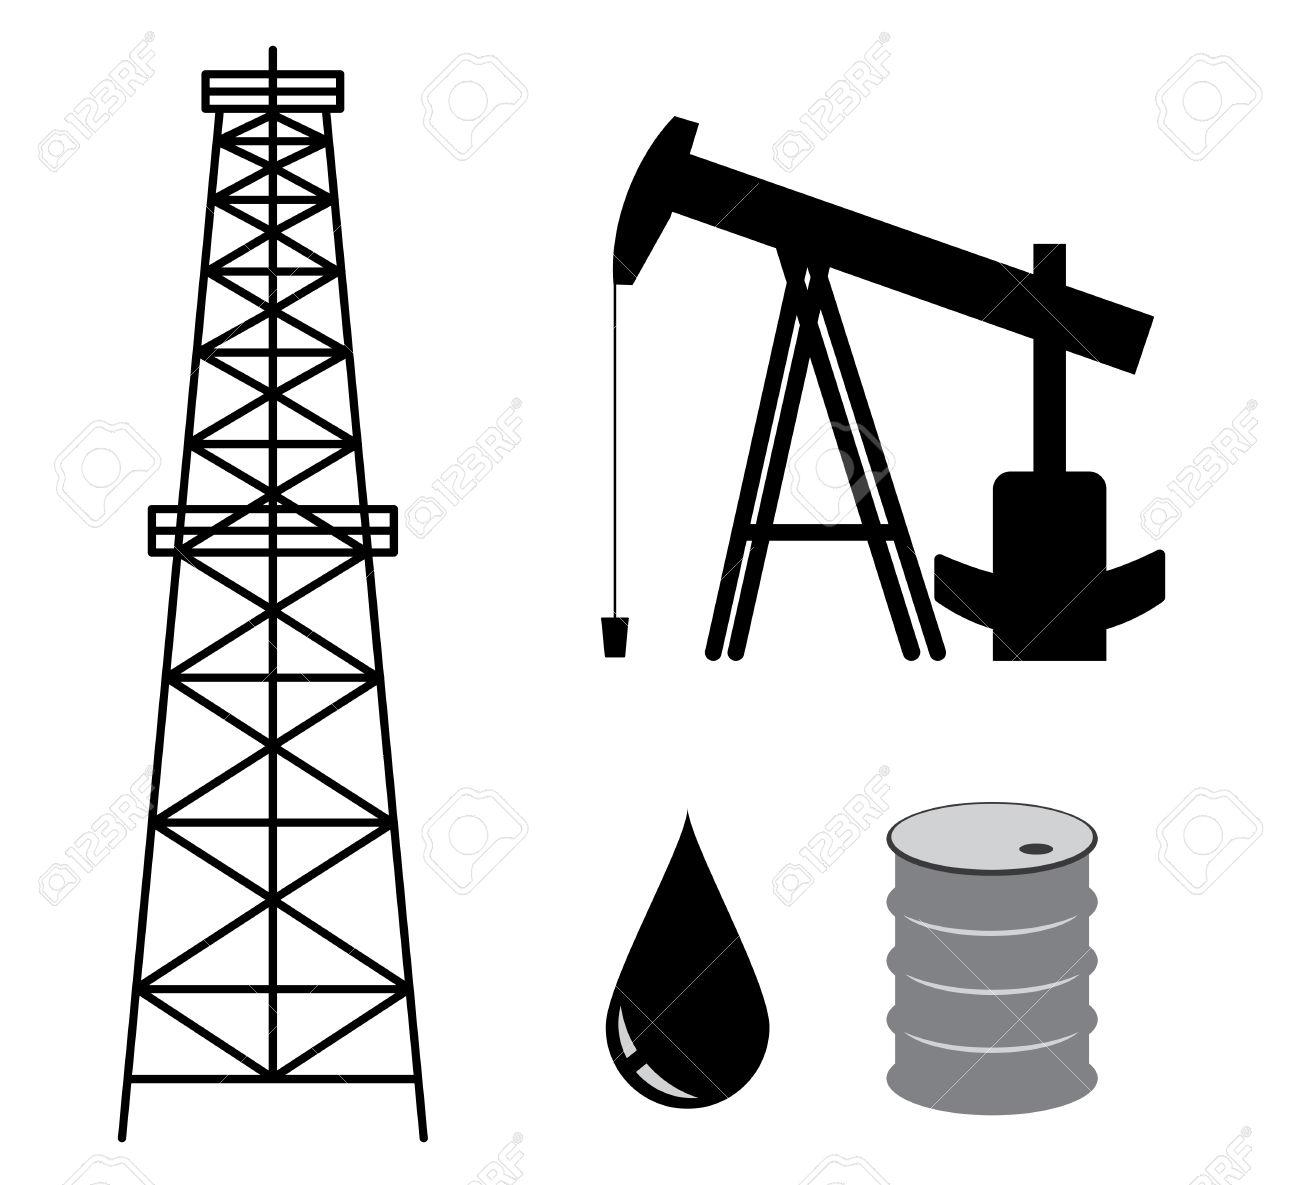 Oil Derrick With Pump And Barrel.